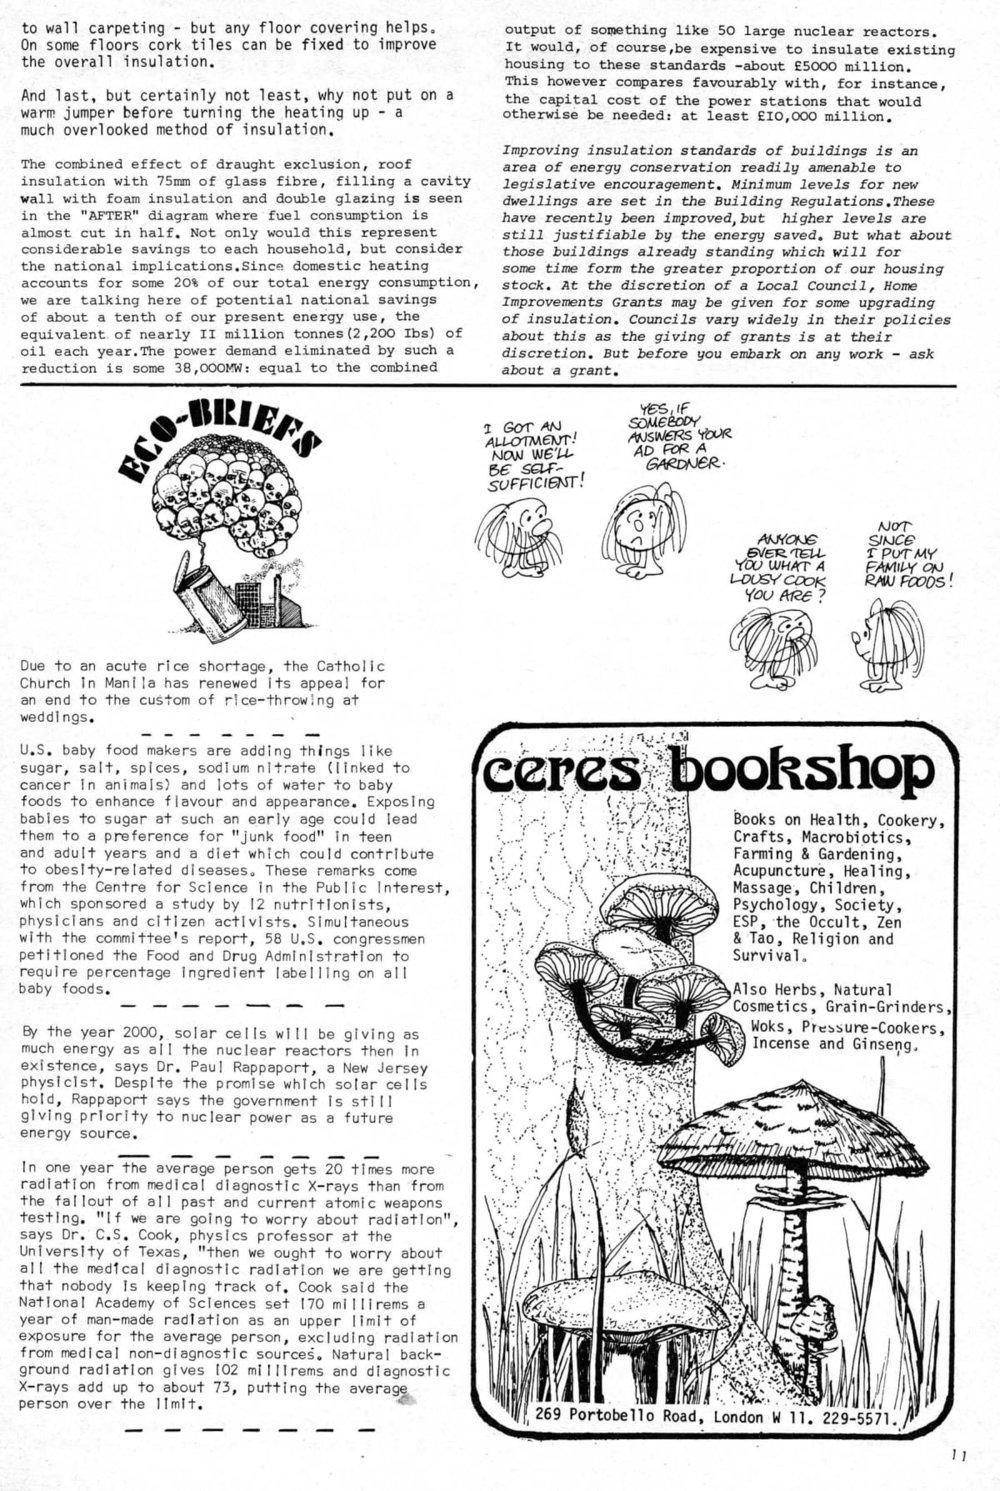 seed-v4-n4-april1975-11.jpg